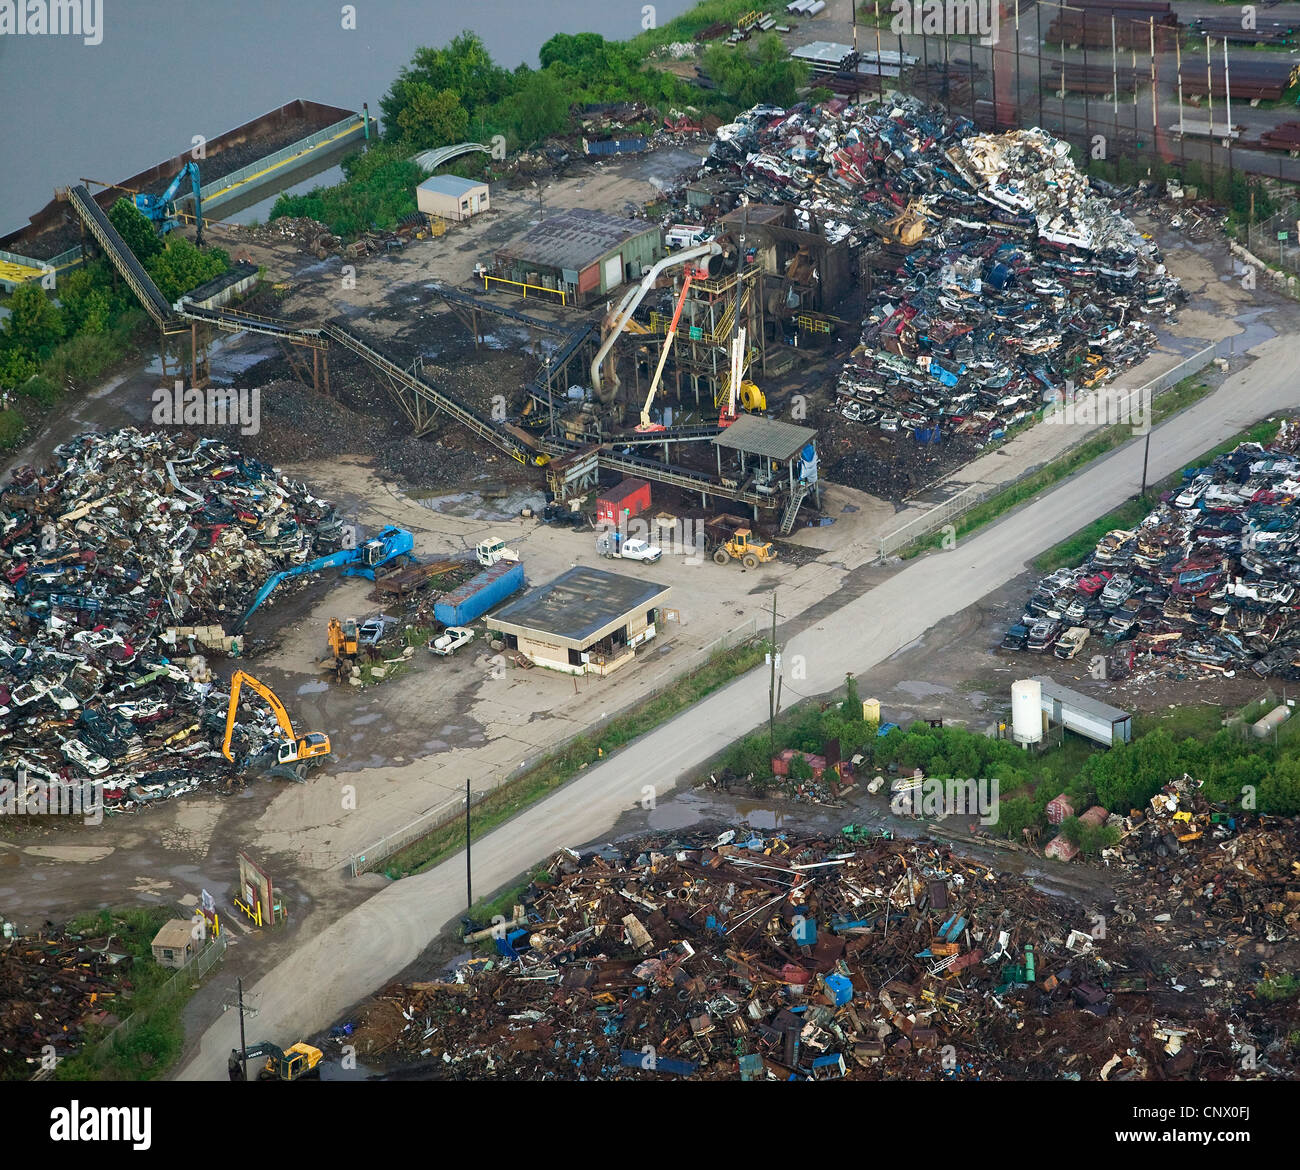 Southern Recycling scrap metal Hurricane Katrina aftermath  Baton Rouge Louisiana - Stock Image